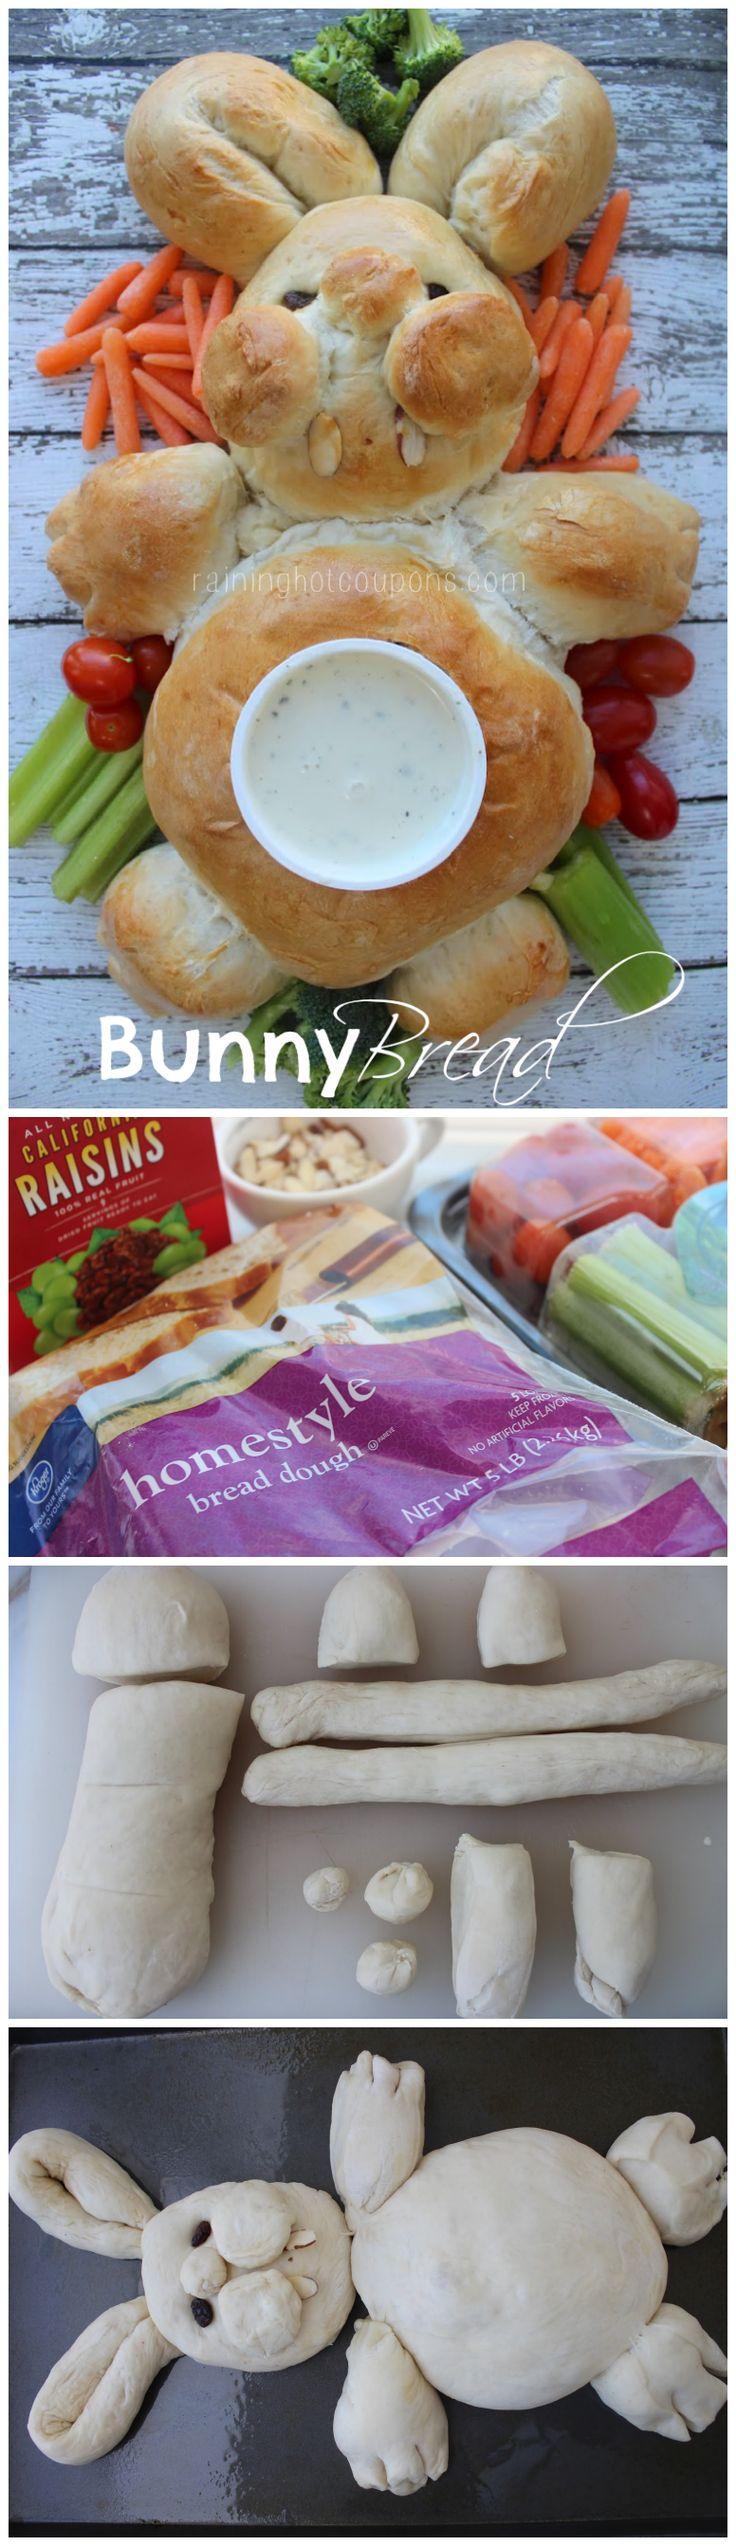 Bunny Bread Recipe